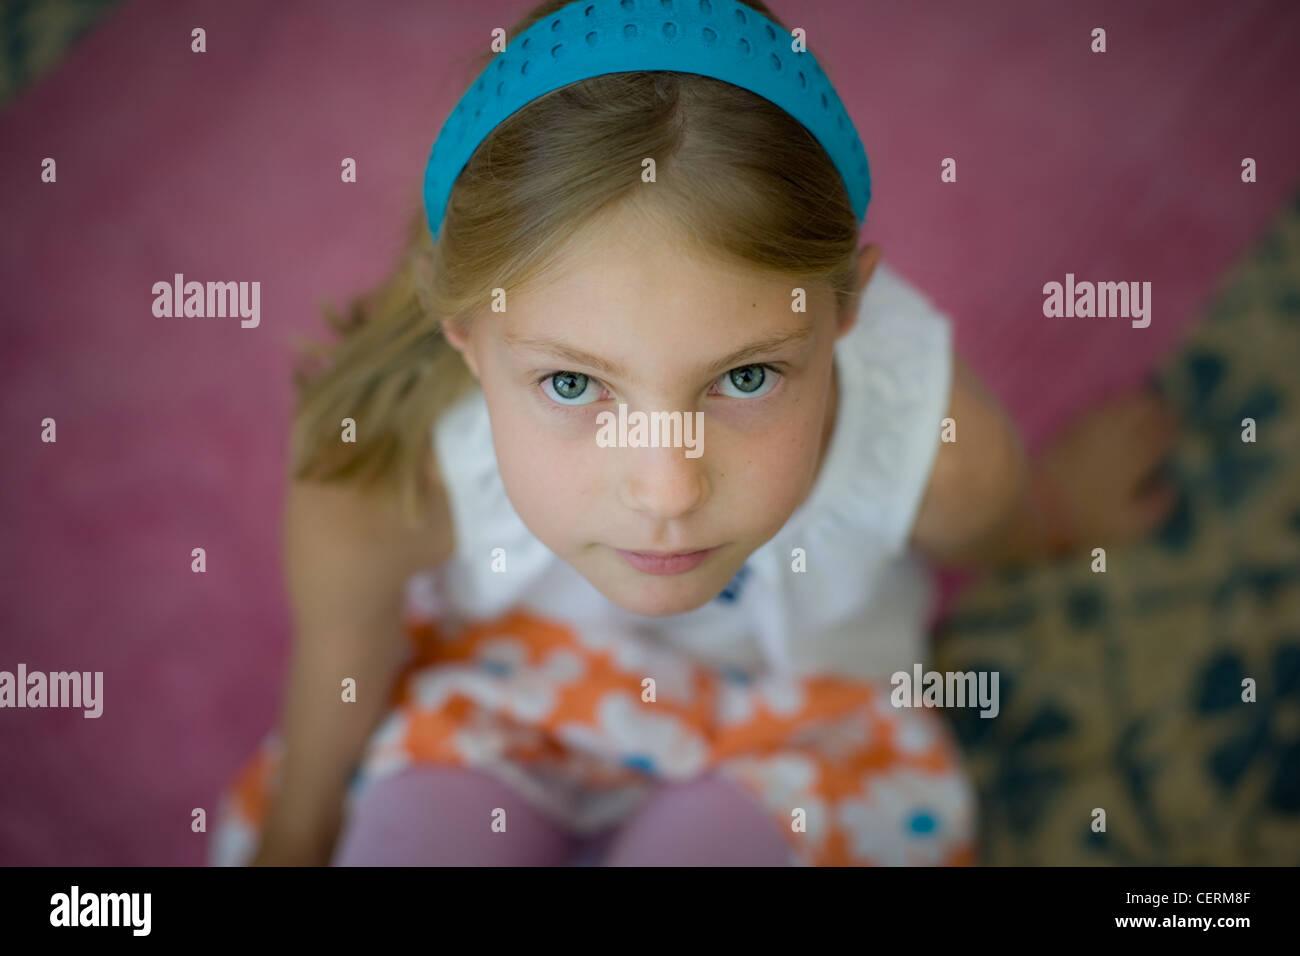 Closeup portrait of a girl wearing a blue headband - Stock Image